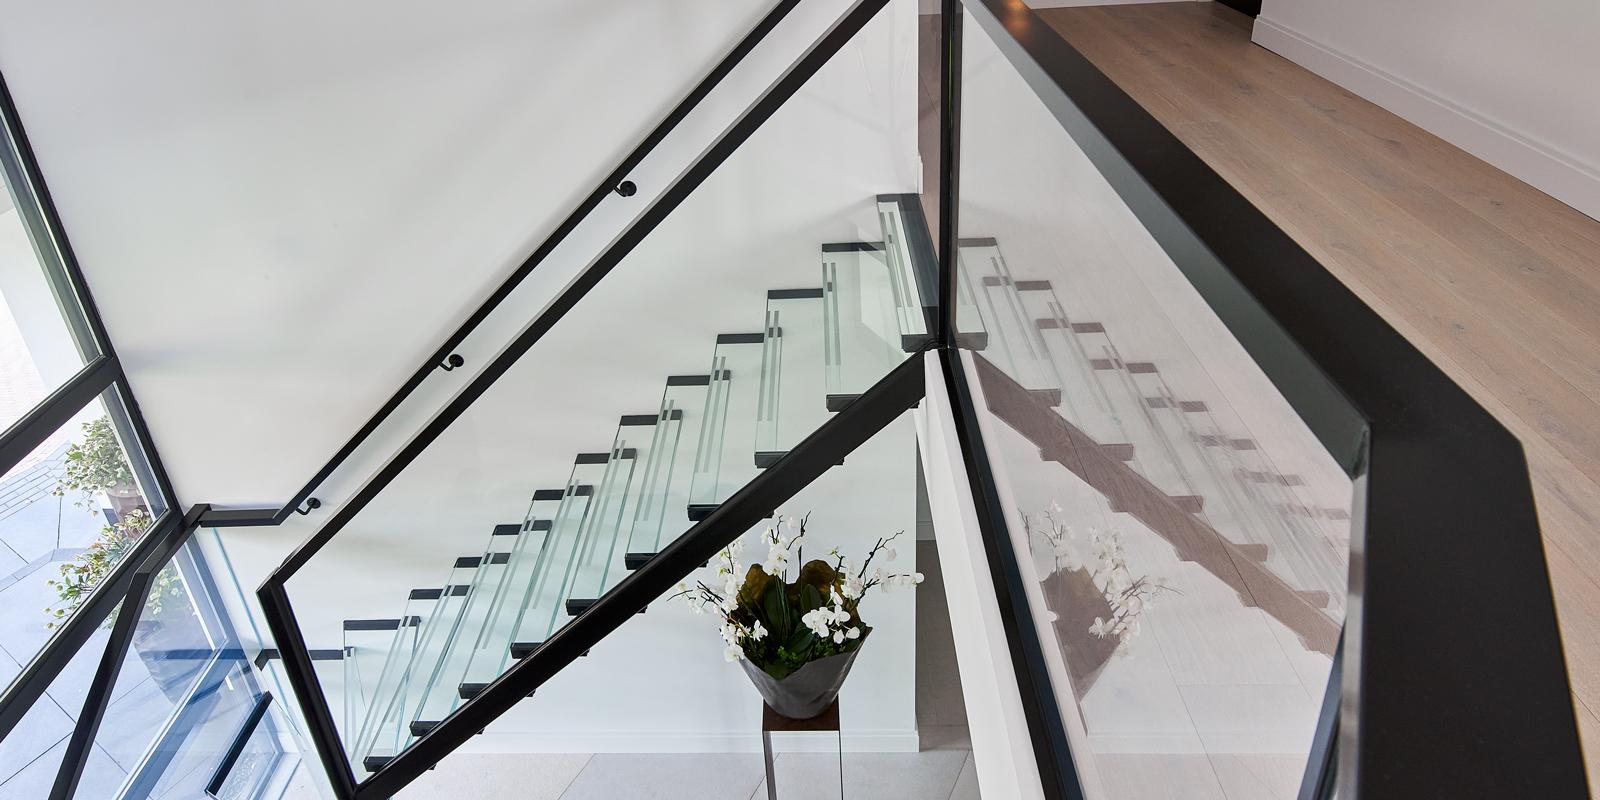 glazen trap, stylish glass, the art of living